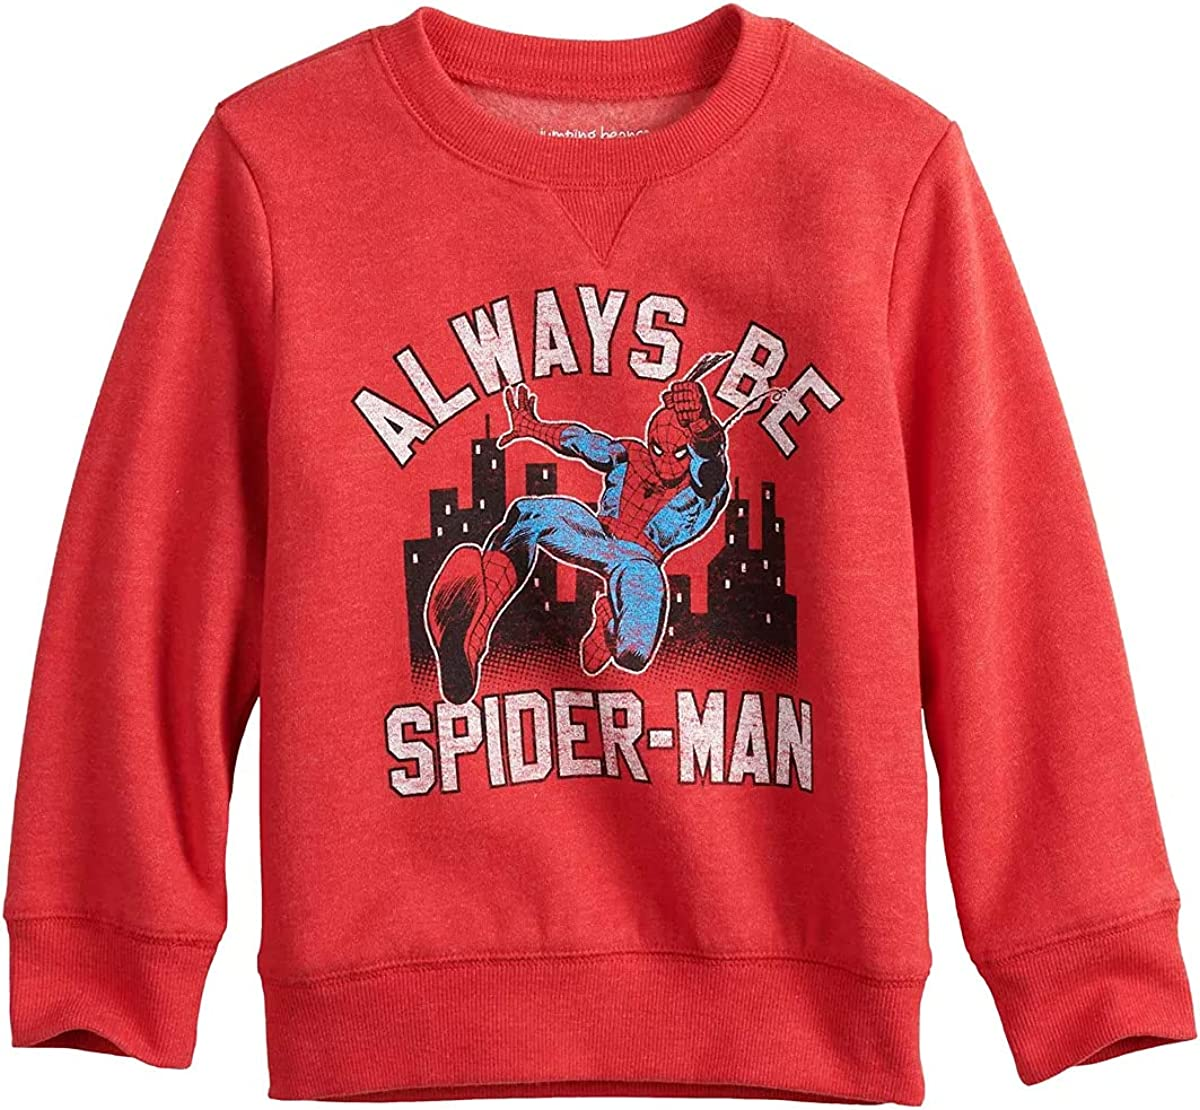 Infant Boy Jumping Beans Spider-Man Graphic Sweatshirt, Red (3 Months)